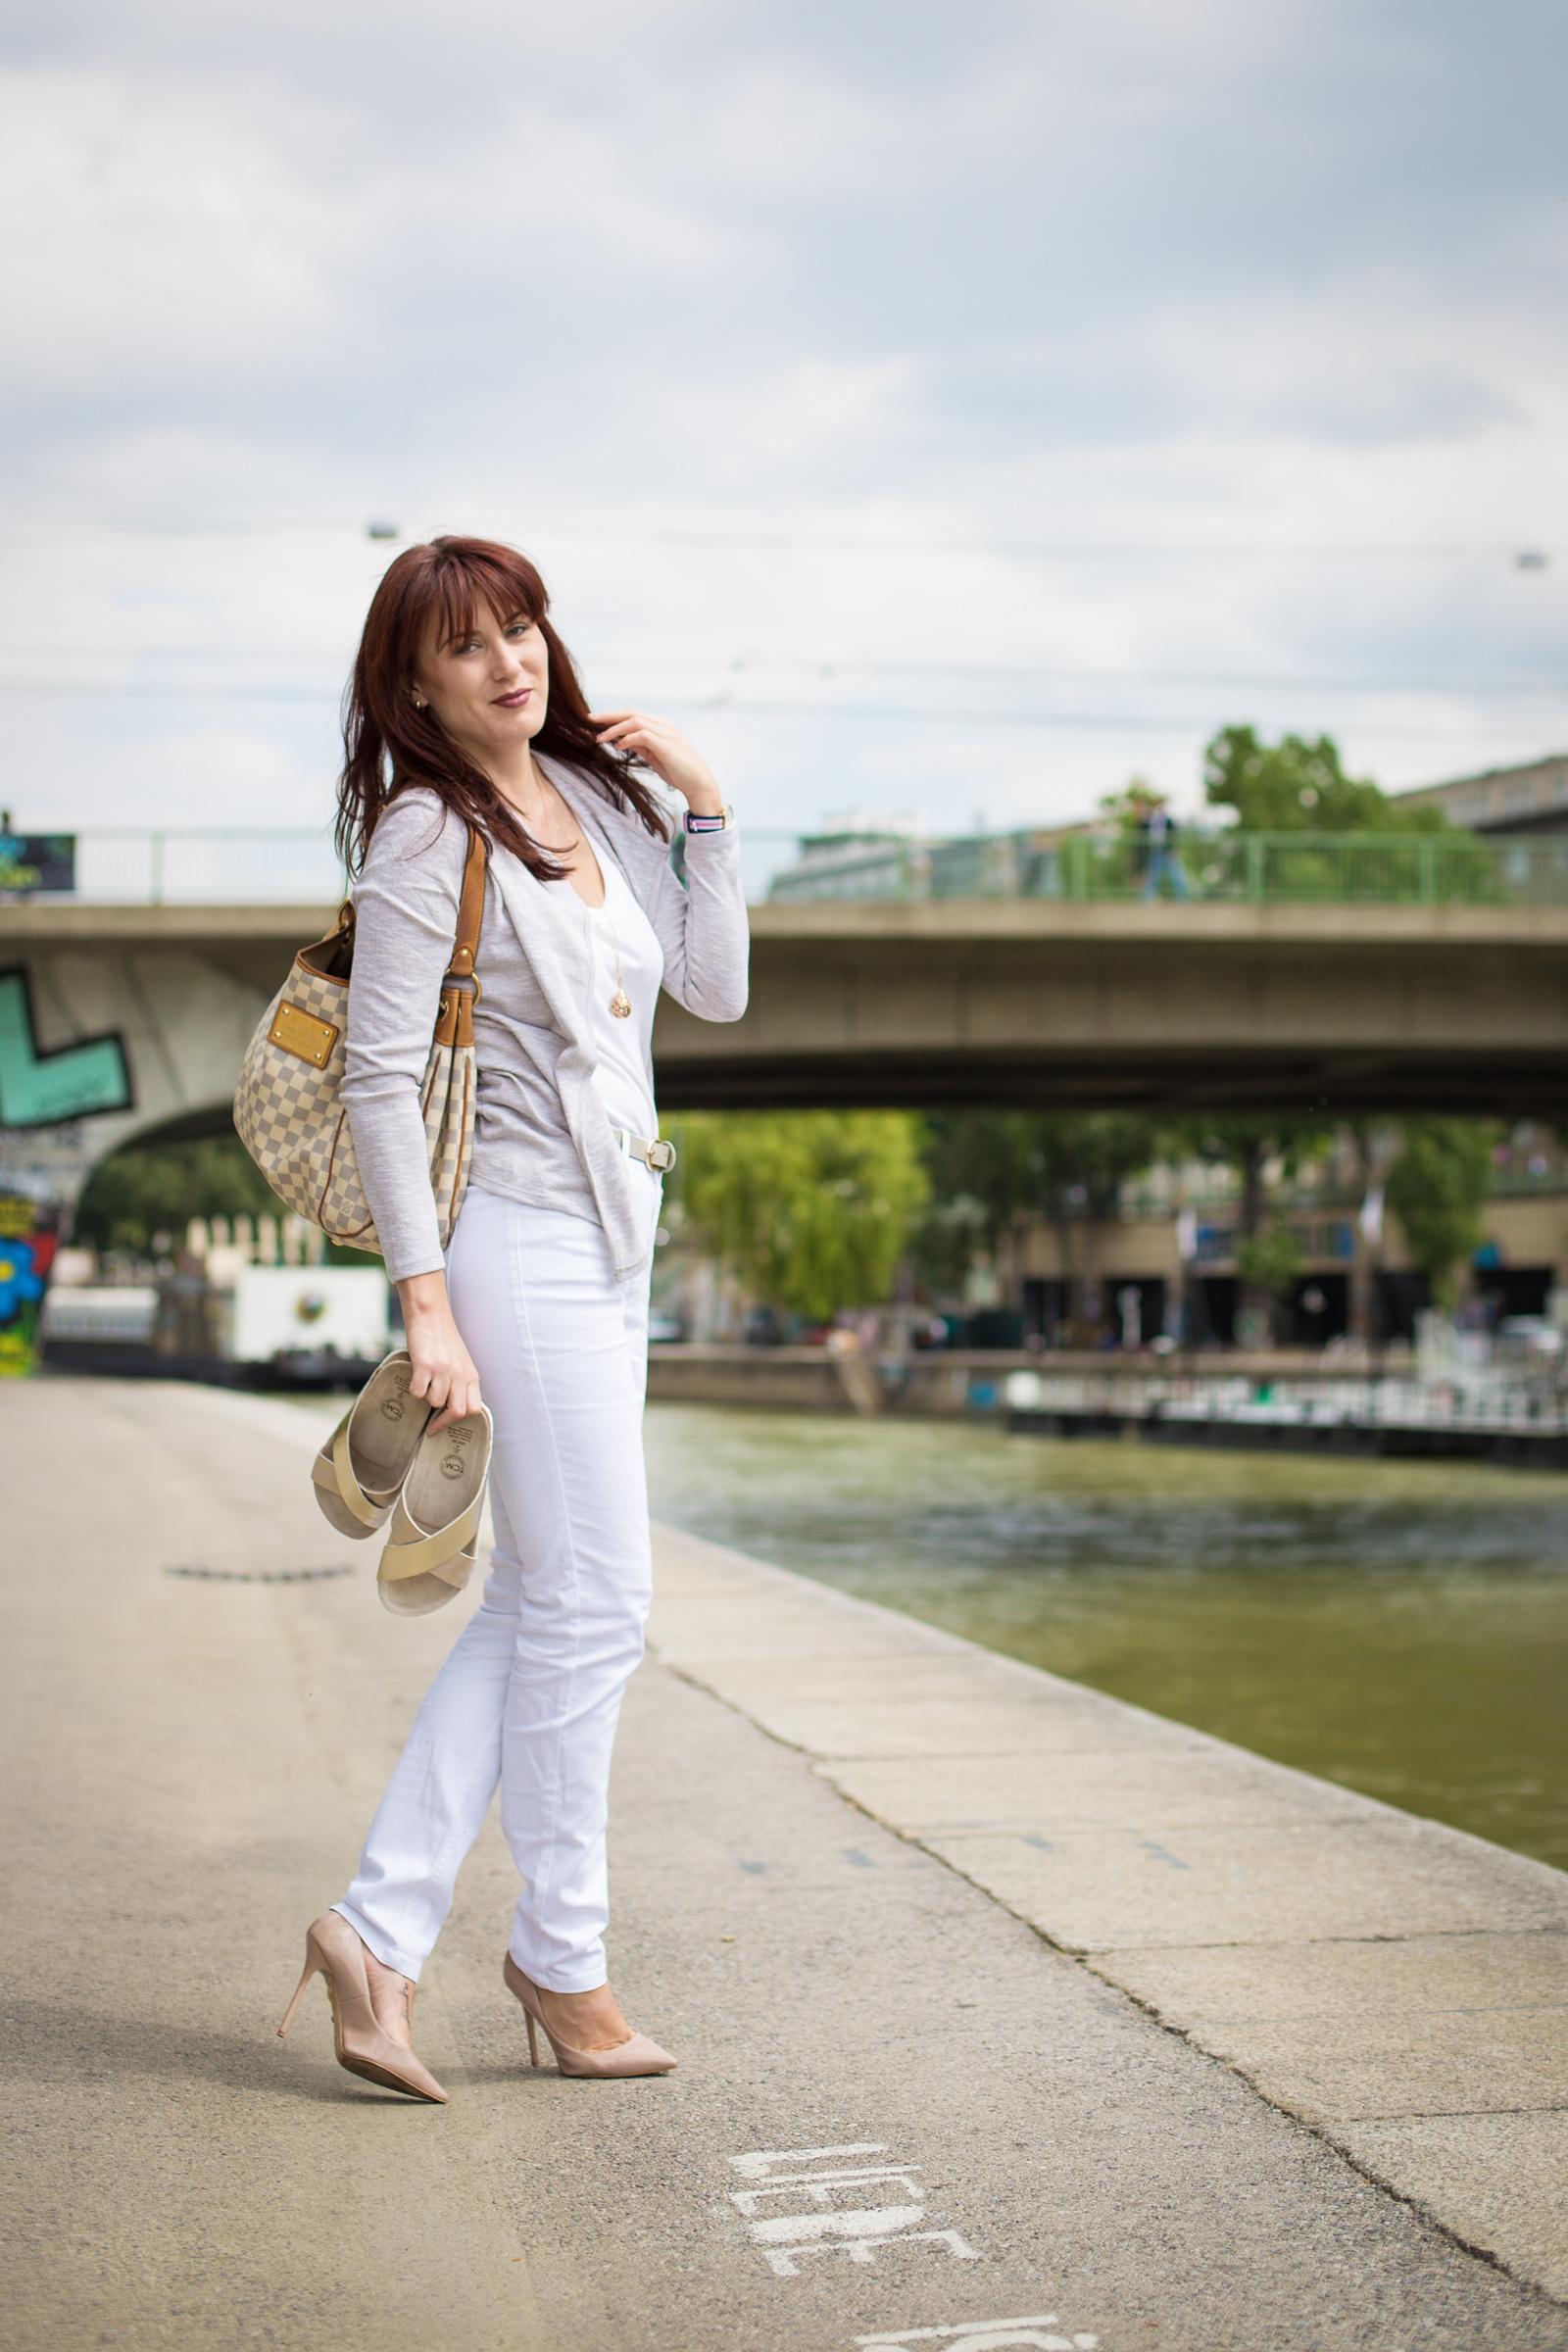 Foto_by_Nadja_Nemetz_NadjaNemetz_Violet_fleur_violetfleur_tchibo_eduscho_sommer_outfit_fashion_mode_sommerlook_1